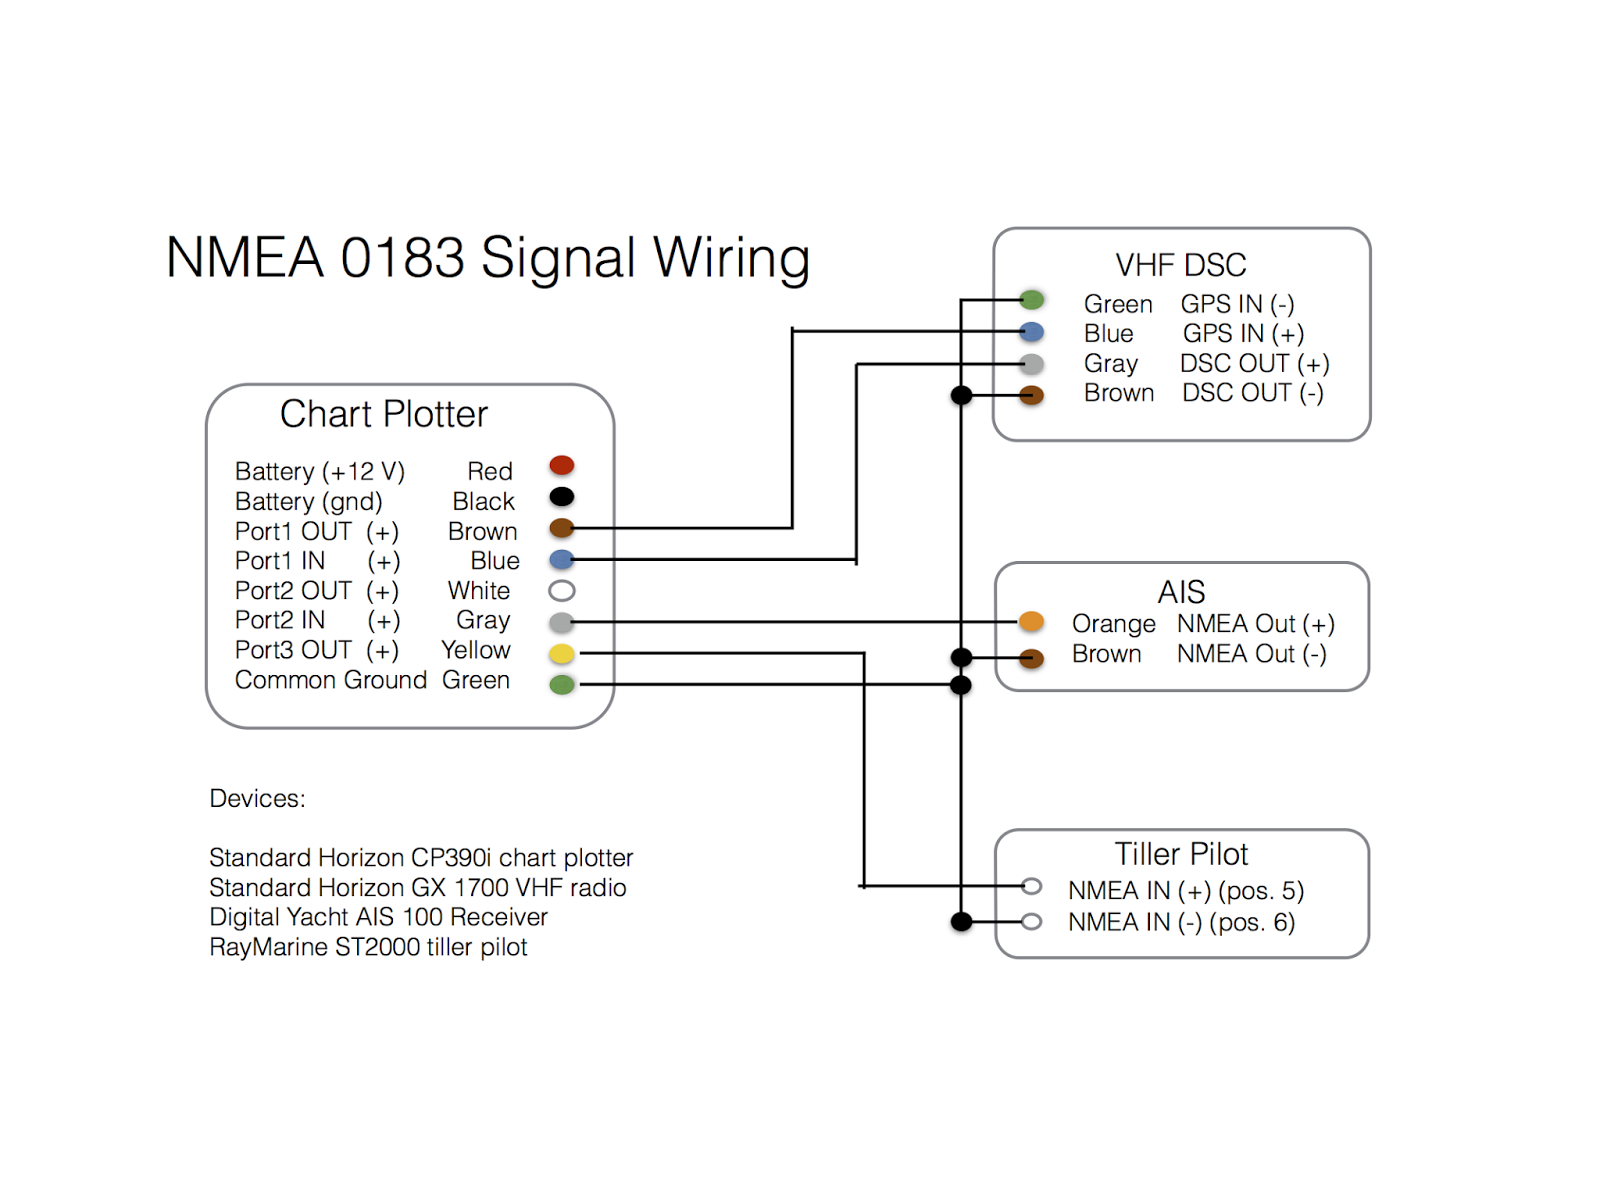 wm_5275] gps battery wiring diagram free image about wiring ... hummingbird nmea 0183 wiring diagram garmin nmea 0183 wire colors bedr cette mohammedshrine librar wiring 101